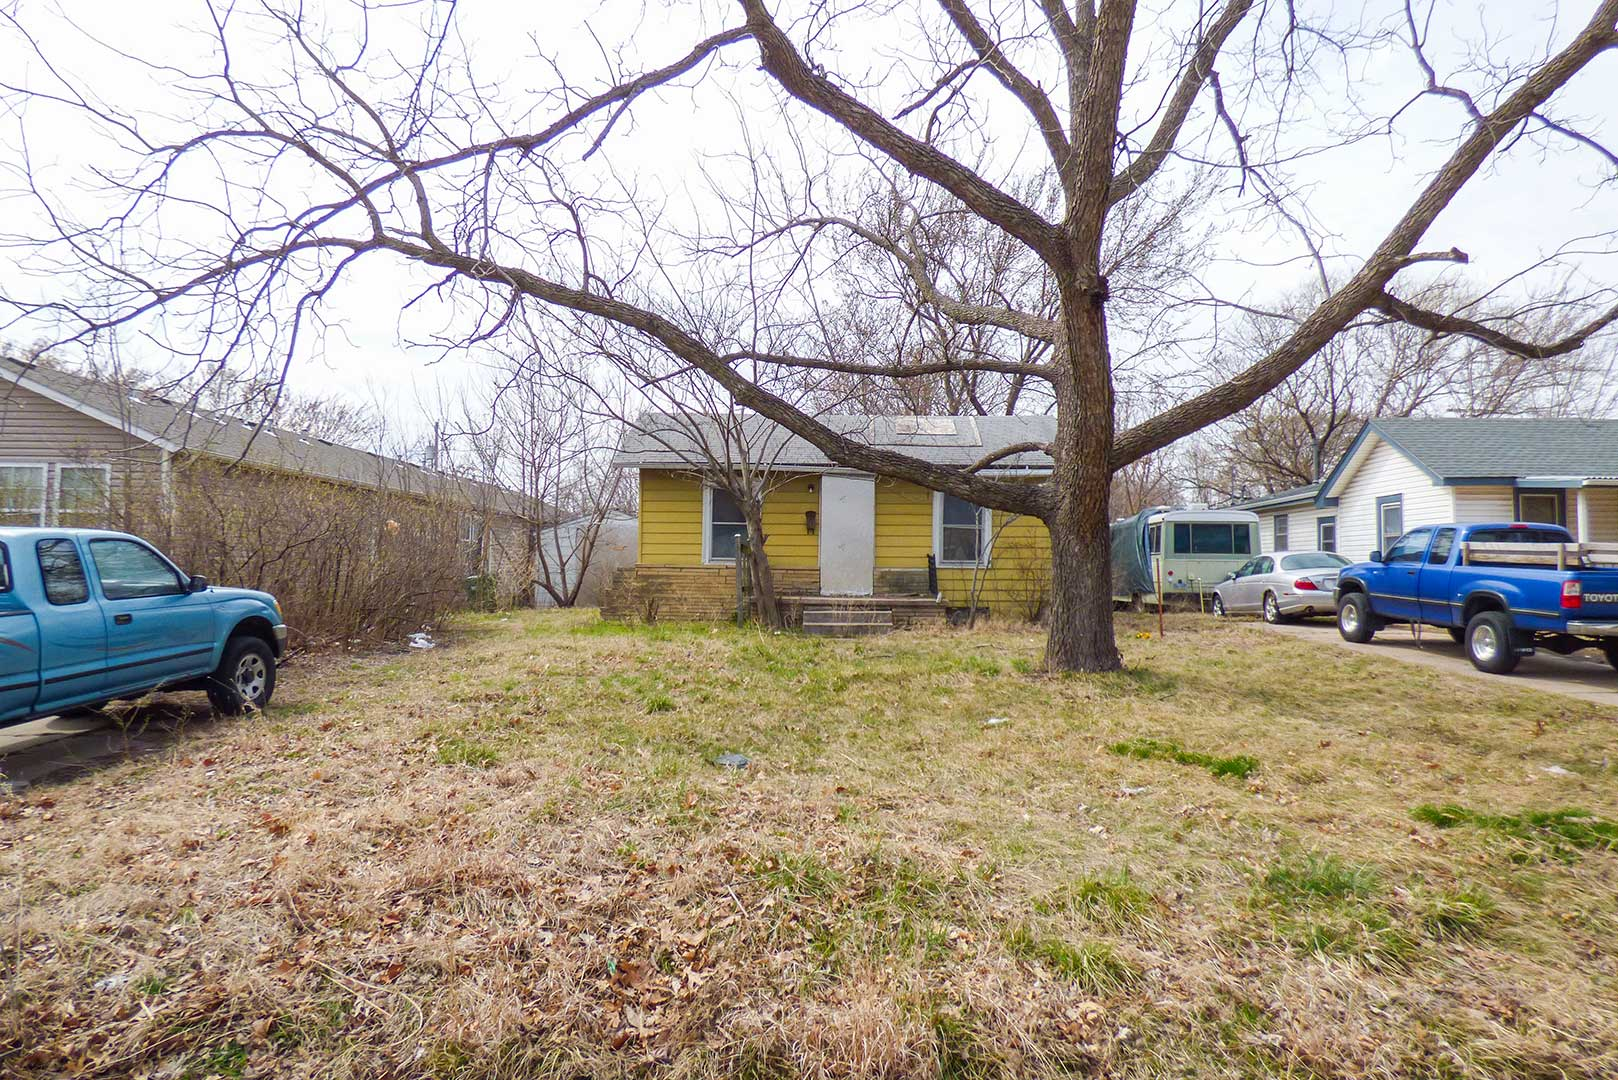 McCurdy Auction - (SE) NO MIN/NO RES - 2-BR, 1-BA Home w/ 1-Car Garage